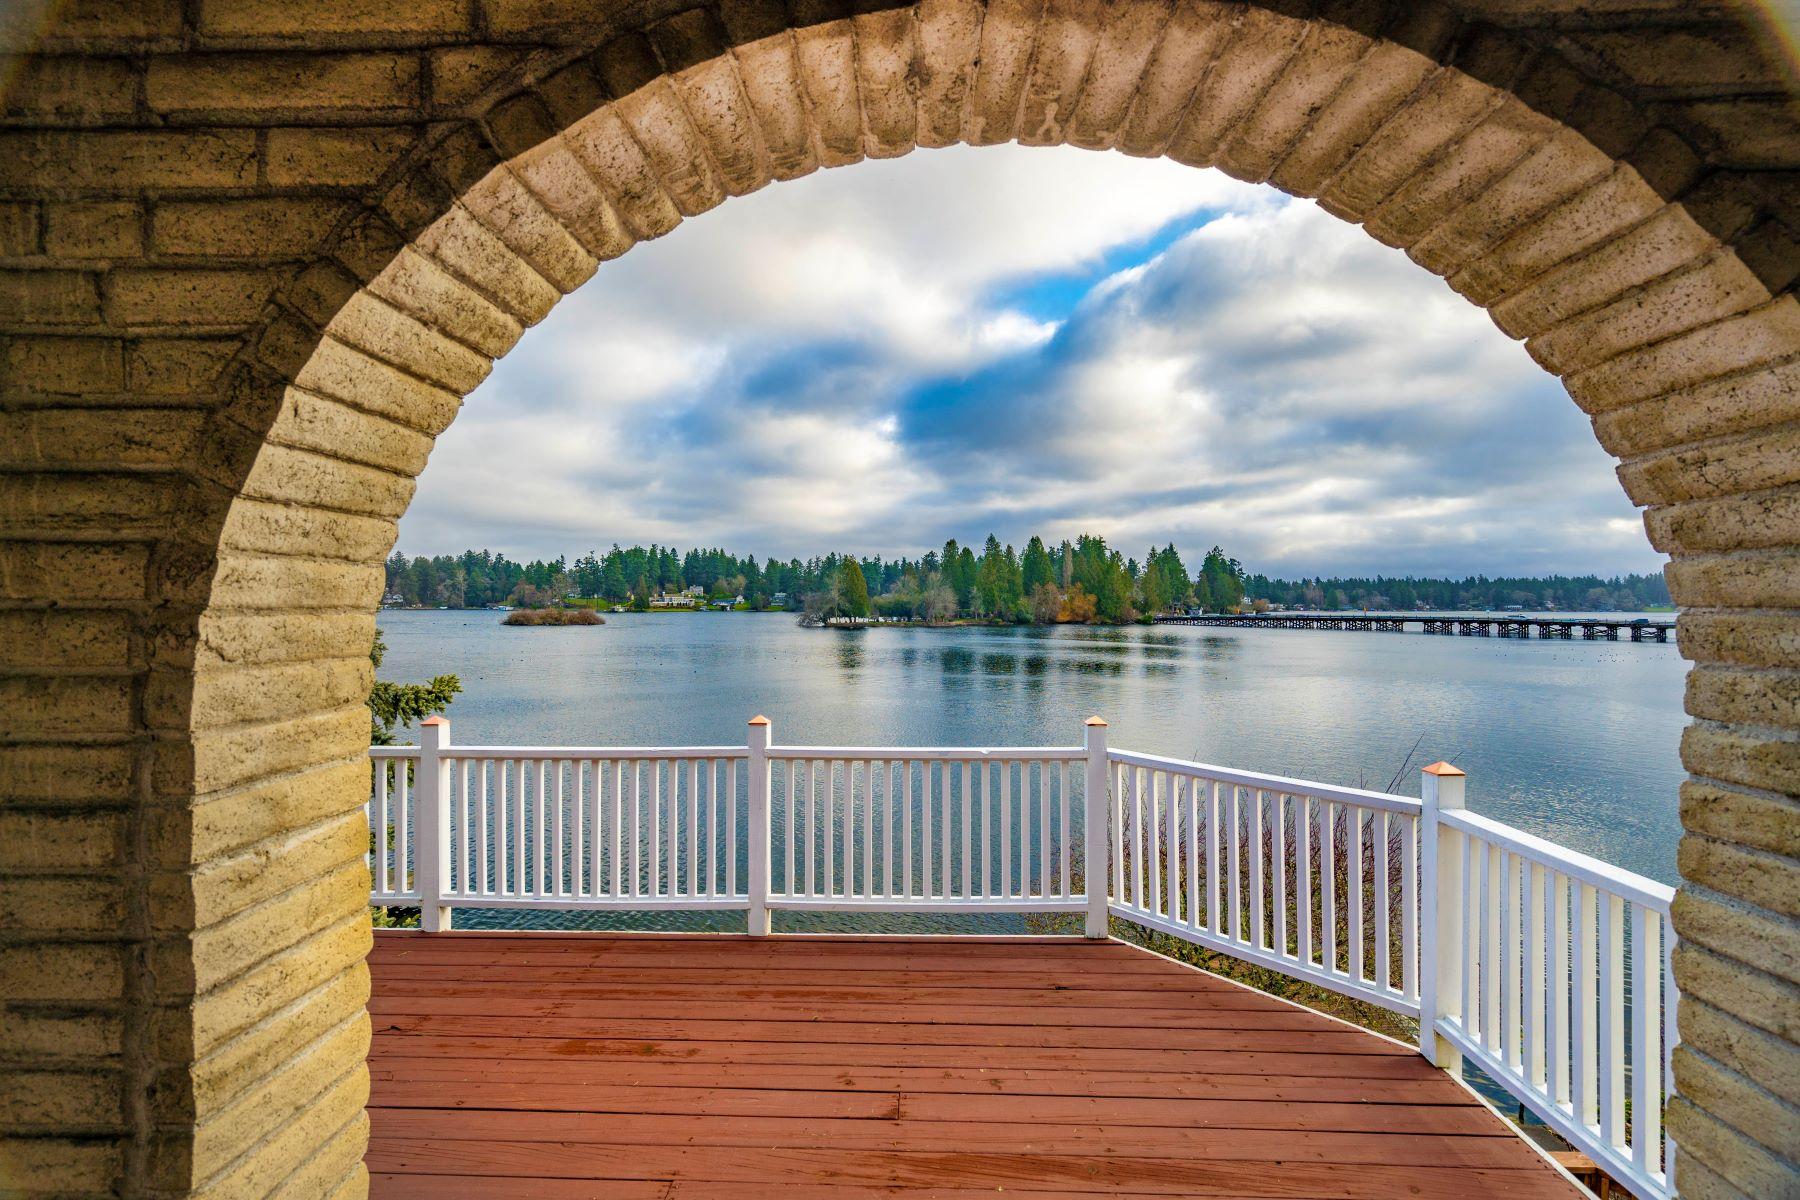 Single Family Homes for Sale at OnLakeSteilacoom.com 9829 Lake Steilacoom Drive SW Lakewood, Washington 98498 United States